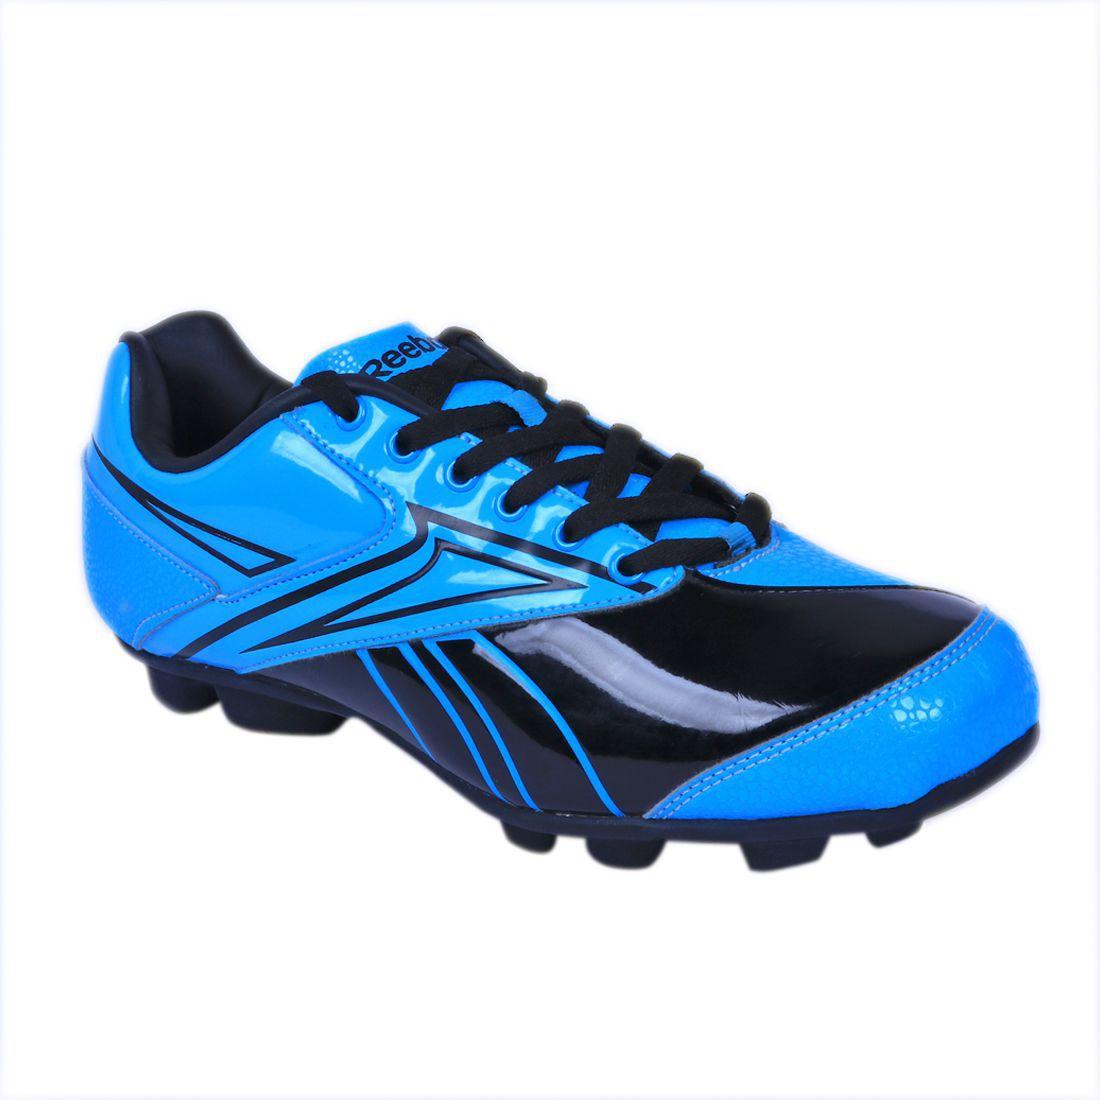 Reebok game on blue football shoes buy reebok game jpg 1100x1100 Reebok  football a7f15cdef